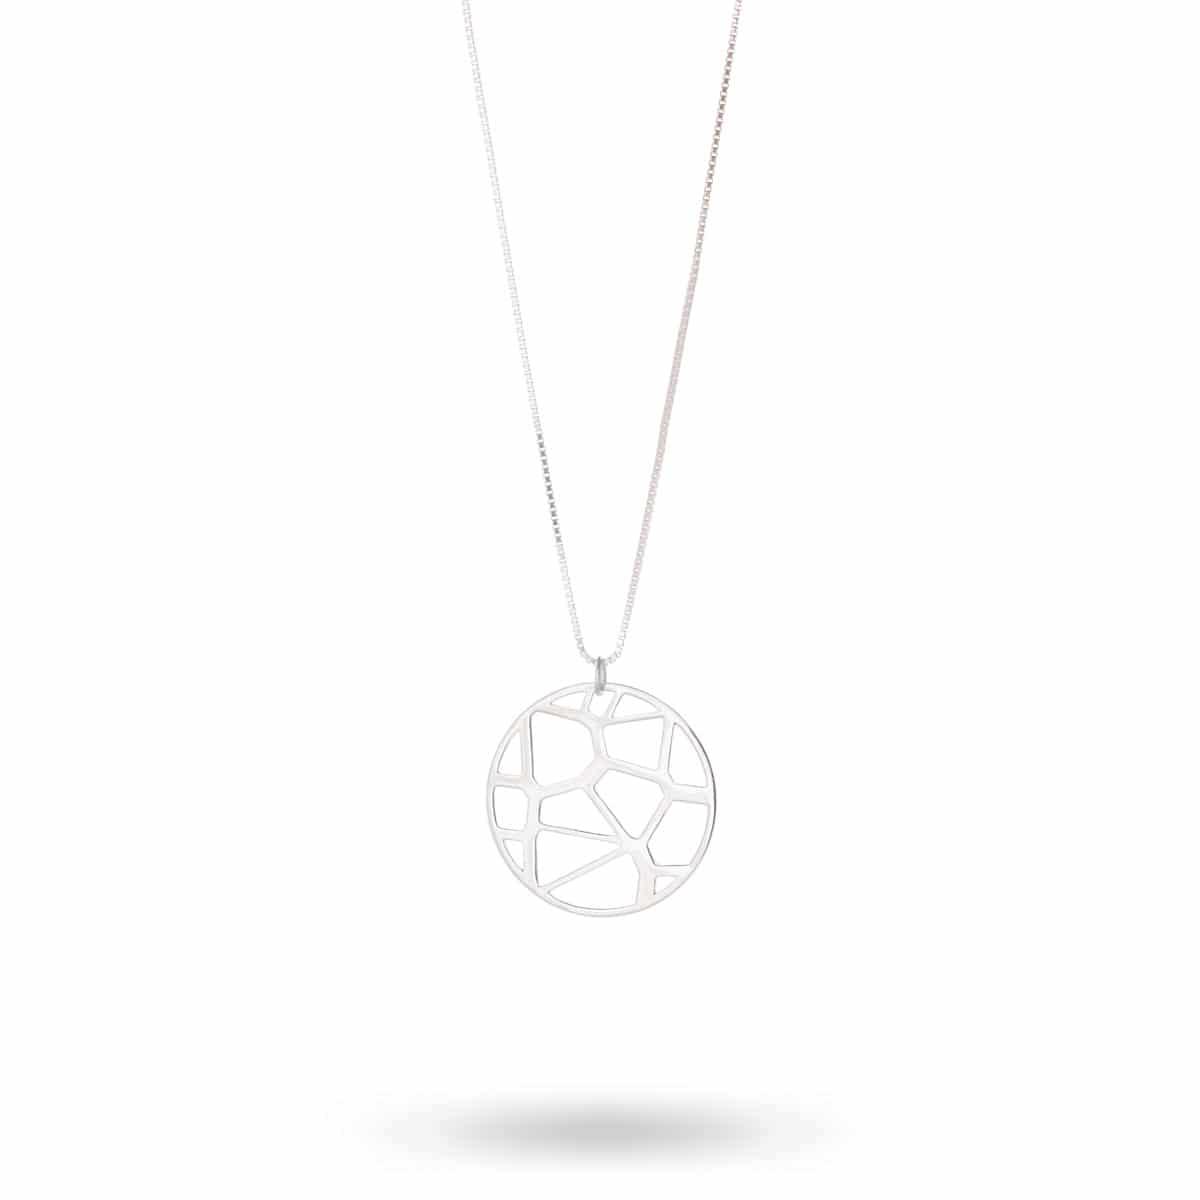 7-Vornoi-pendant-silver-1200px